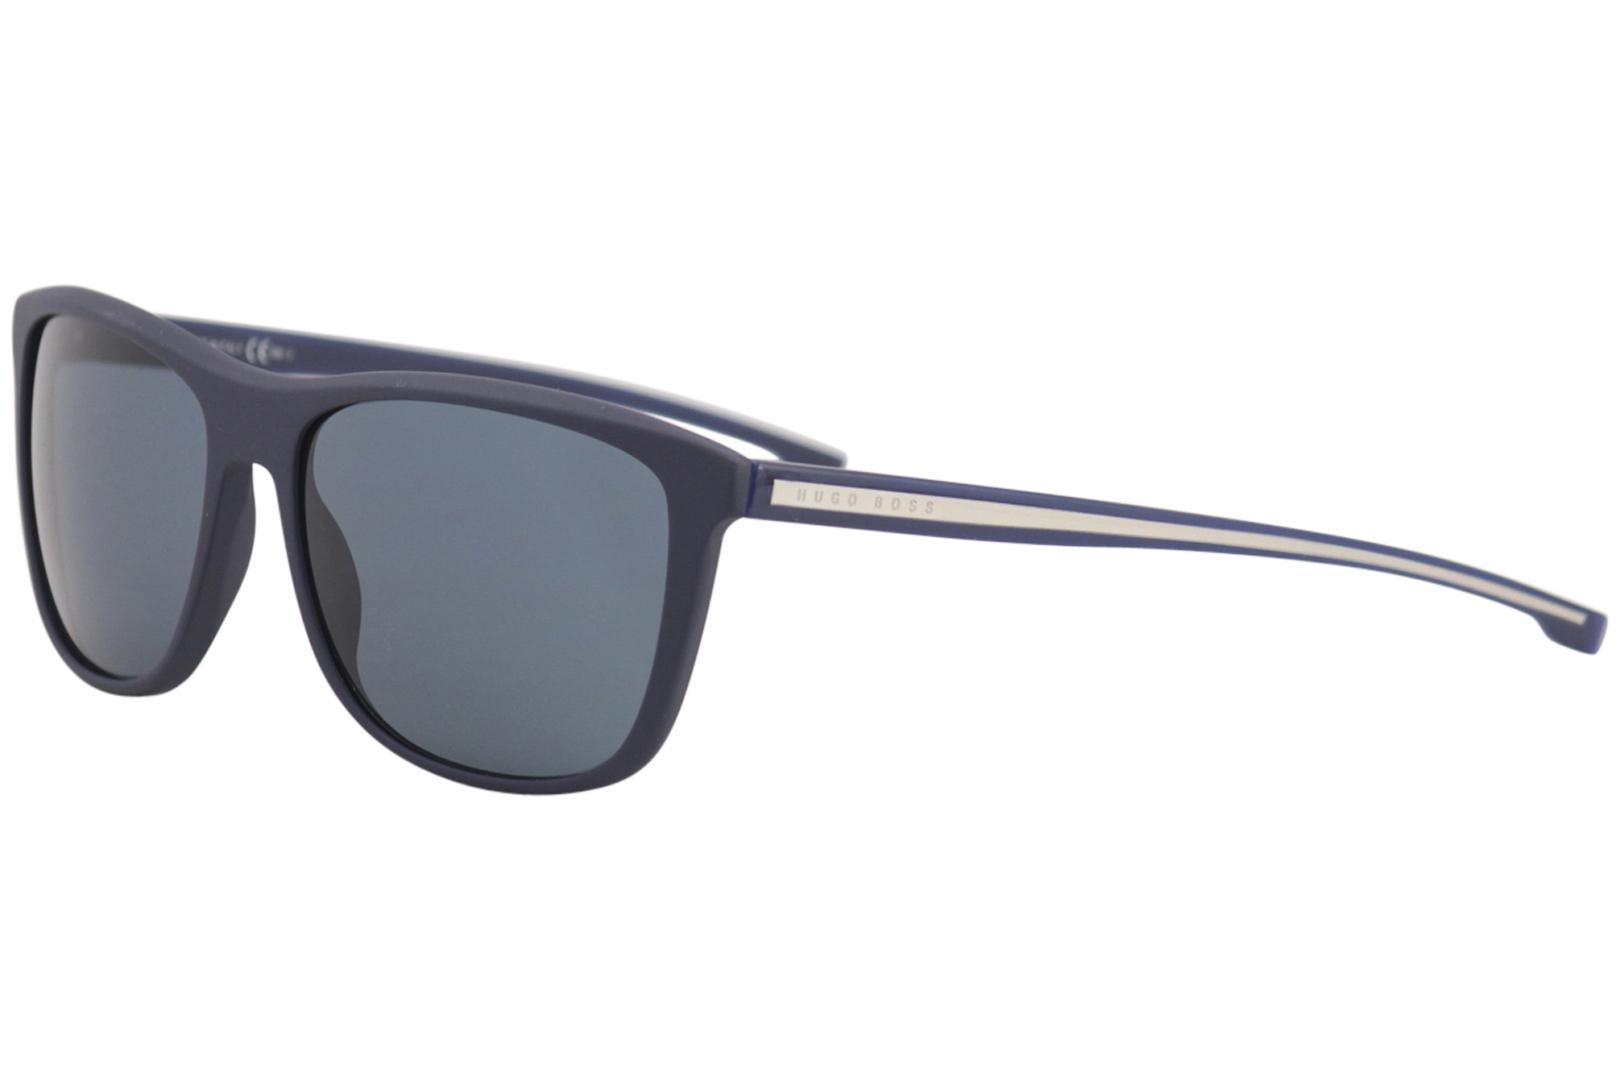 Hugo Boss Men's 0874S 0874/S Fashion Square Sunglasses